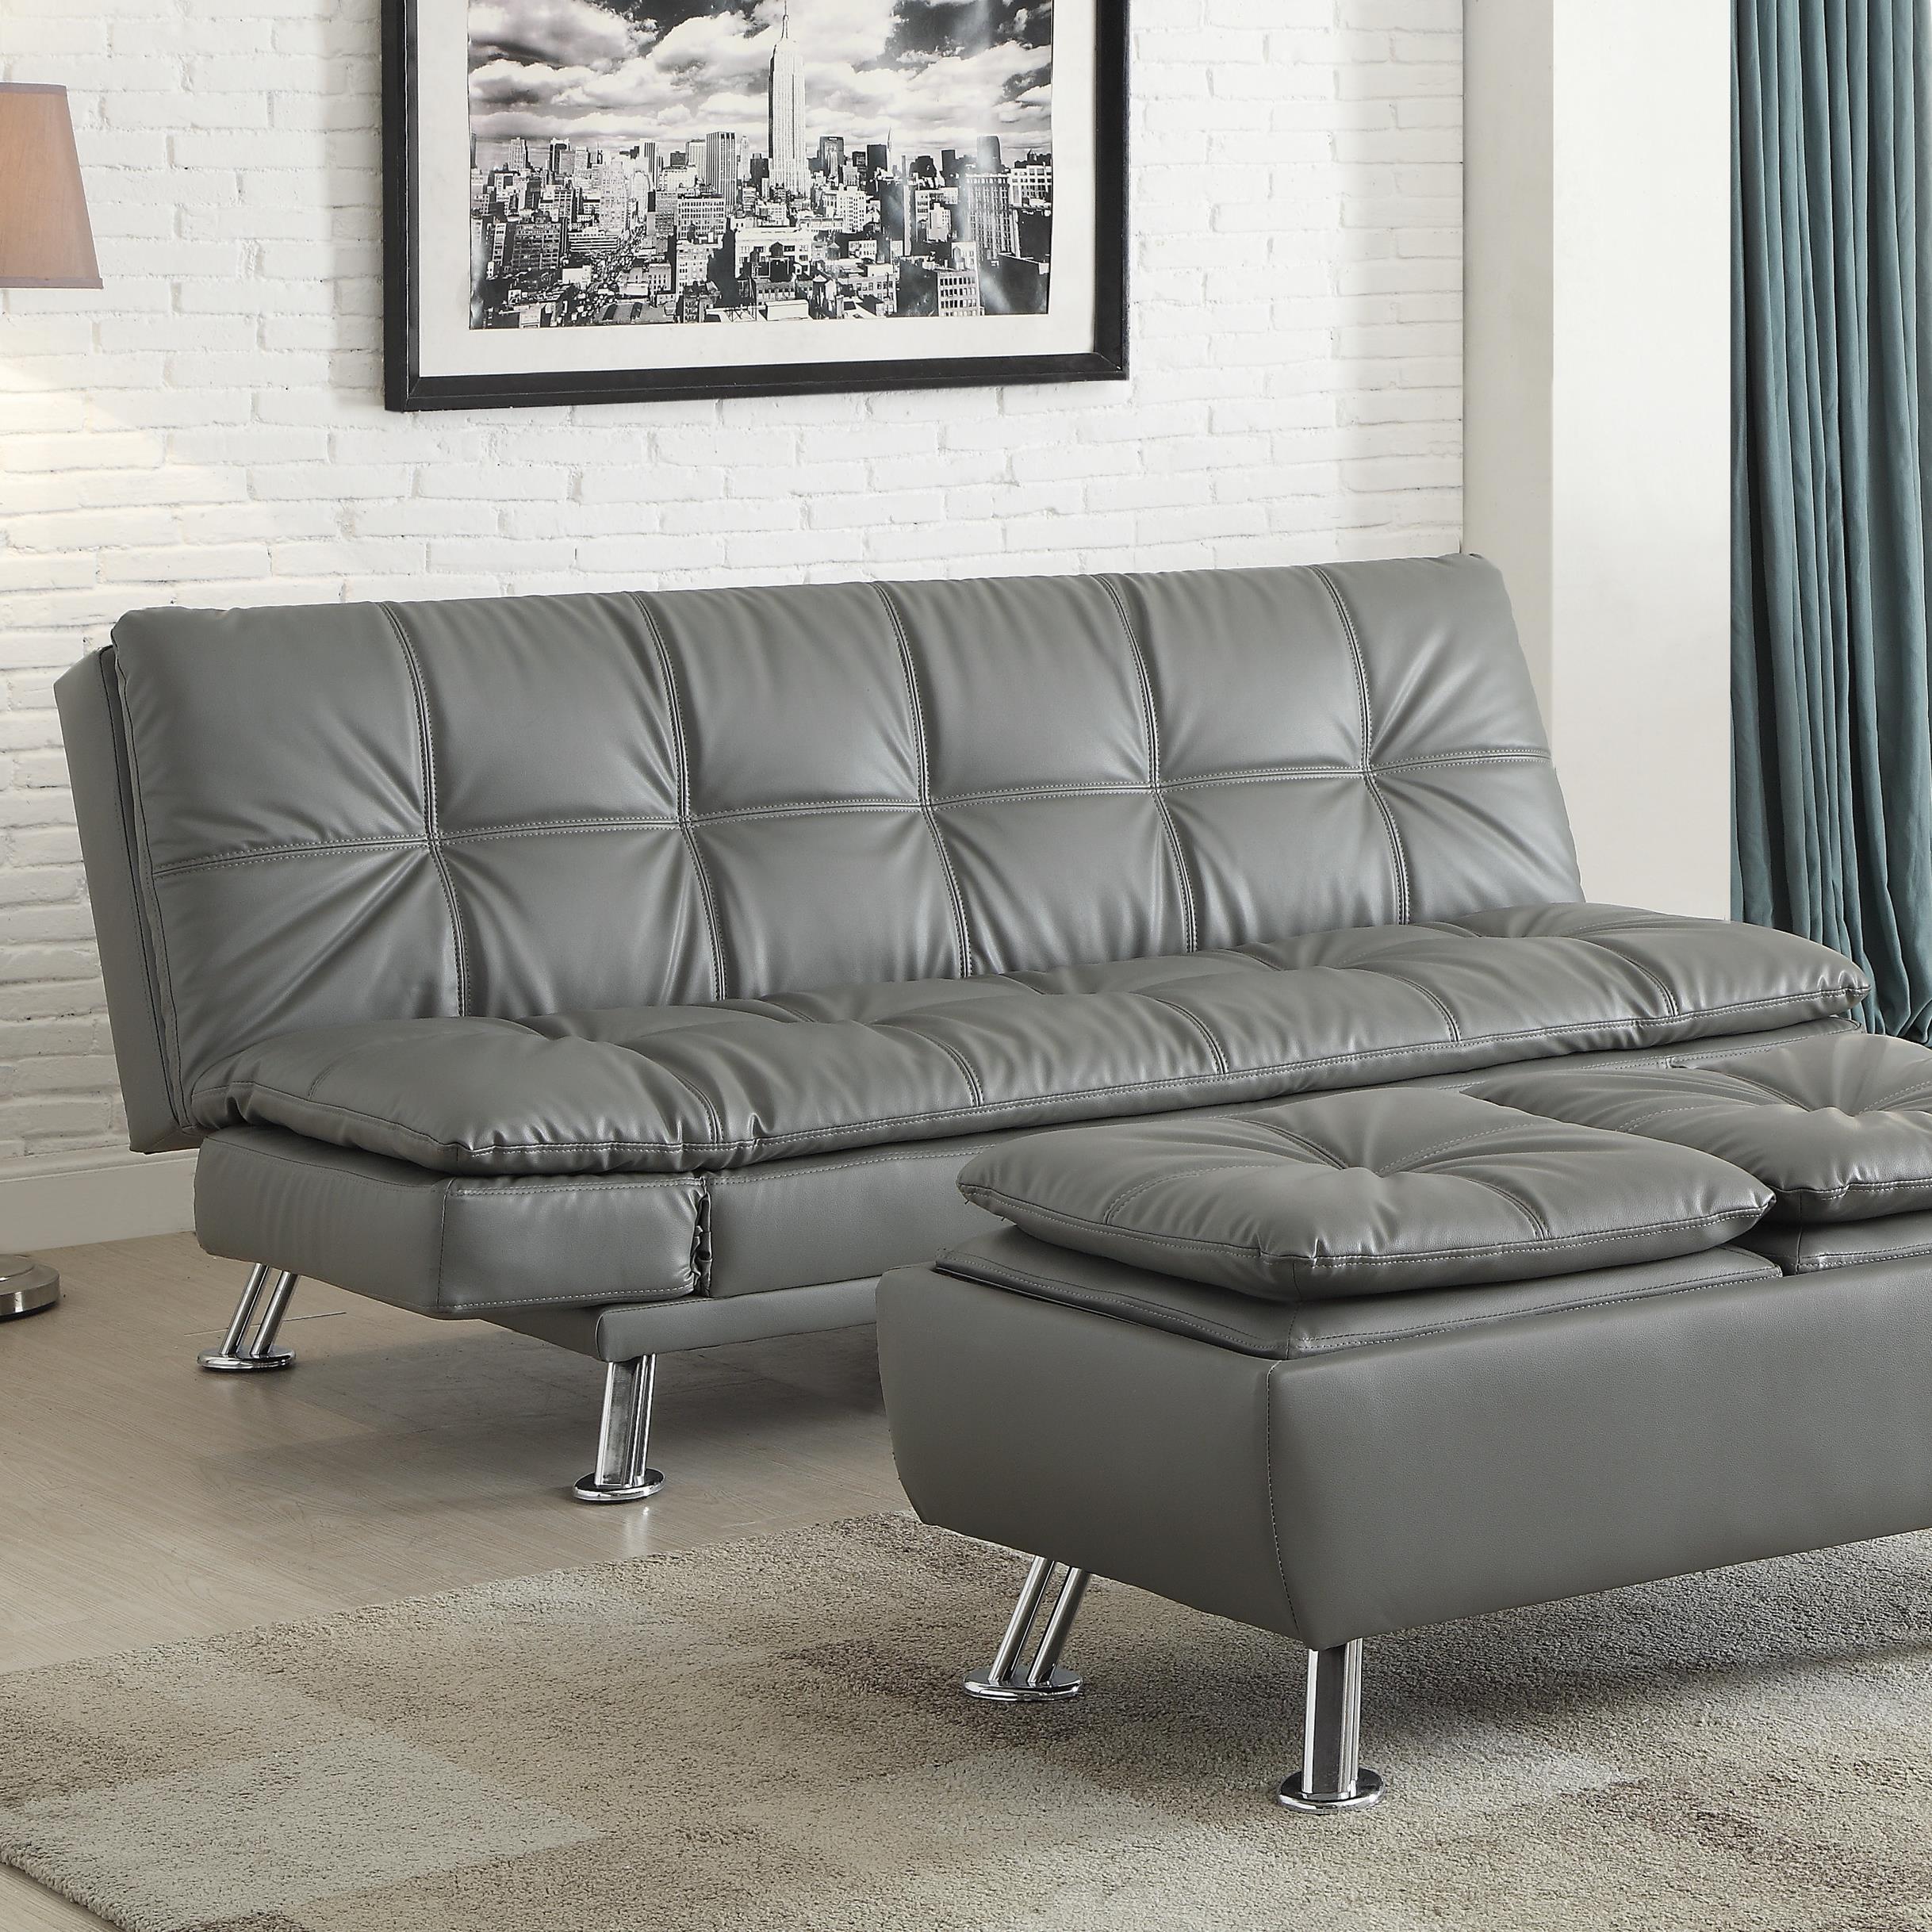 Coaster For Furniture Legs Home Decor